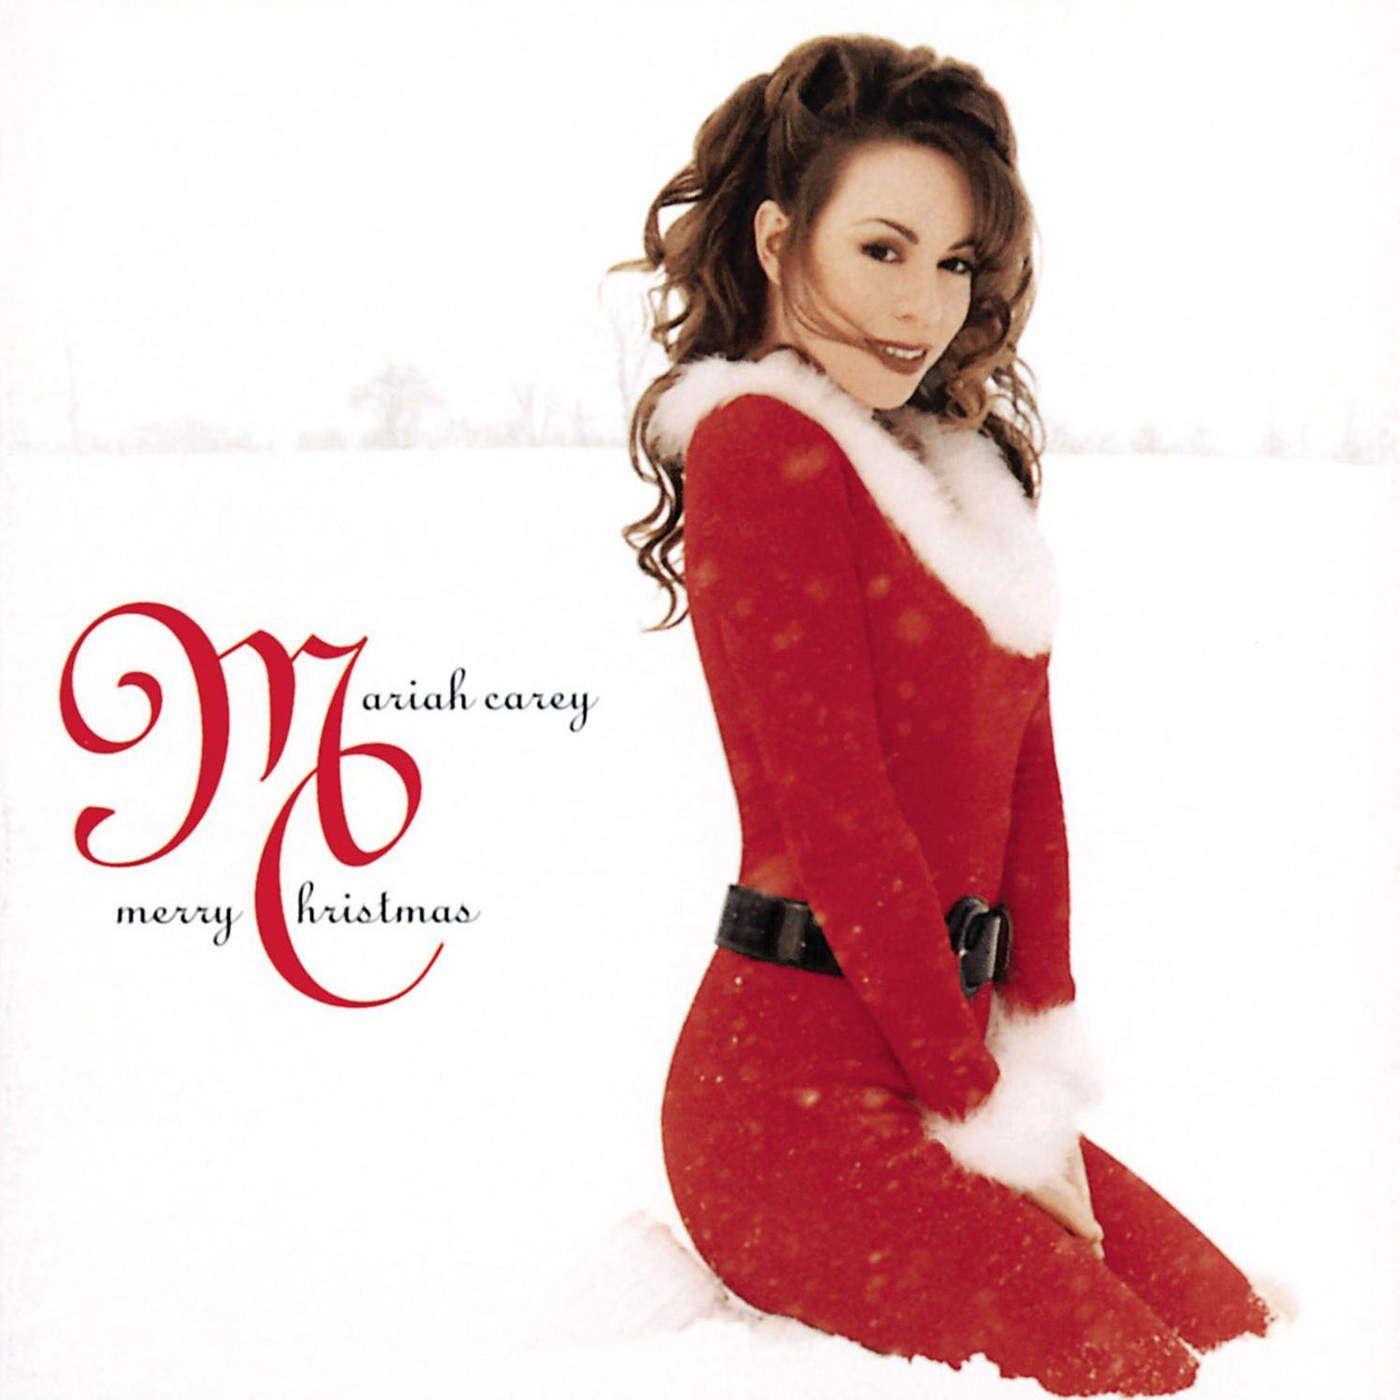 Mariah Carey Merry Christmas 1994 Flac Image Cue Mariah Carey Christmas Album Mariah Carey Christmas Mariah Carey Merry Christmas